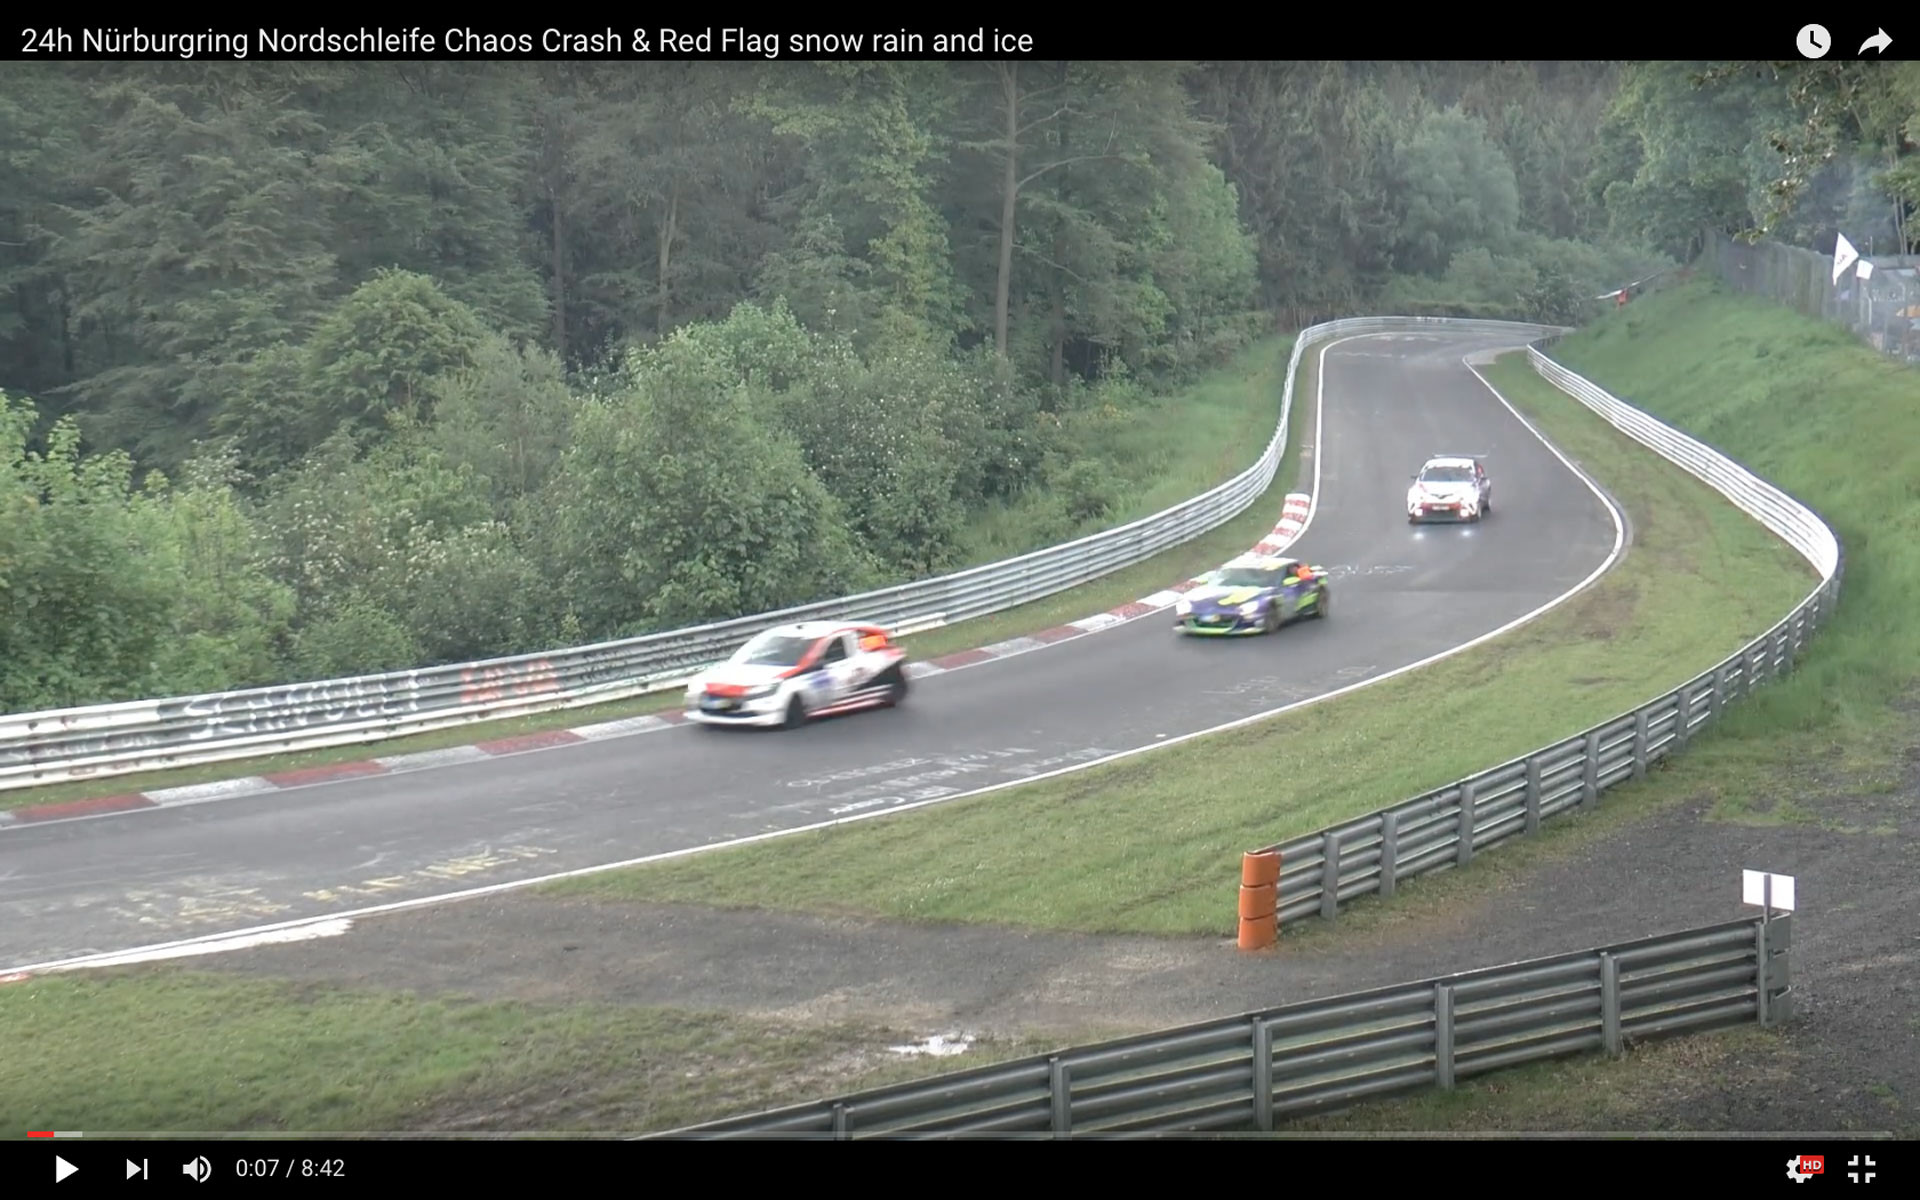 hail_nurburgring_n24_1